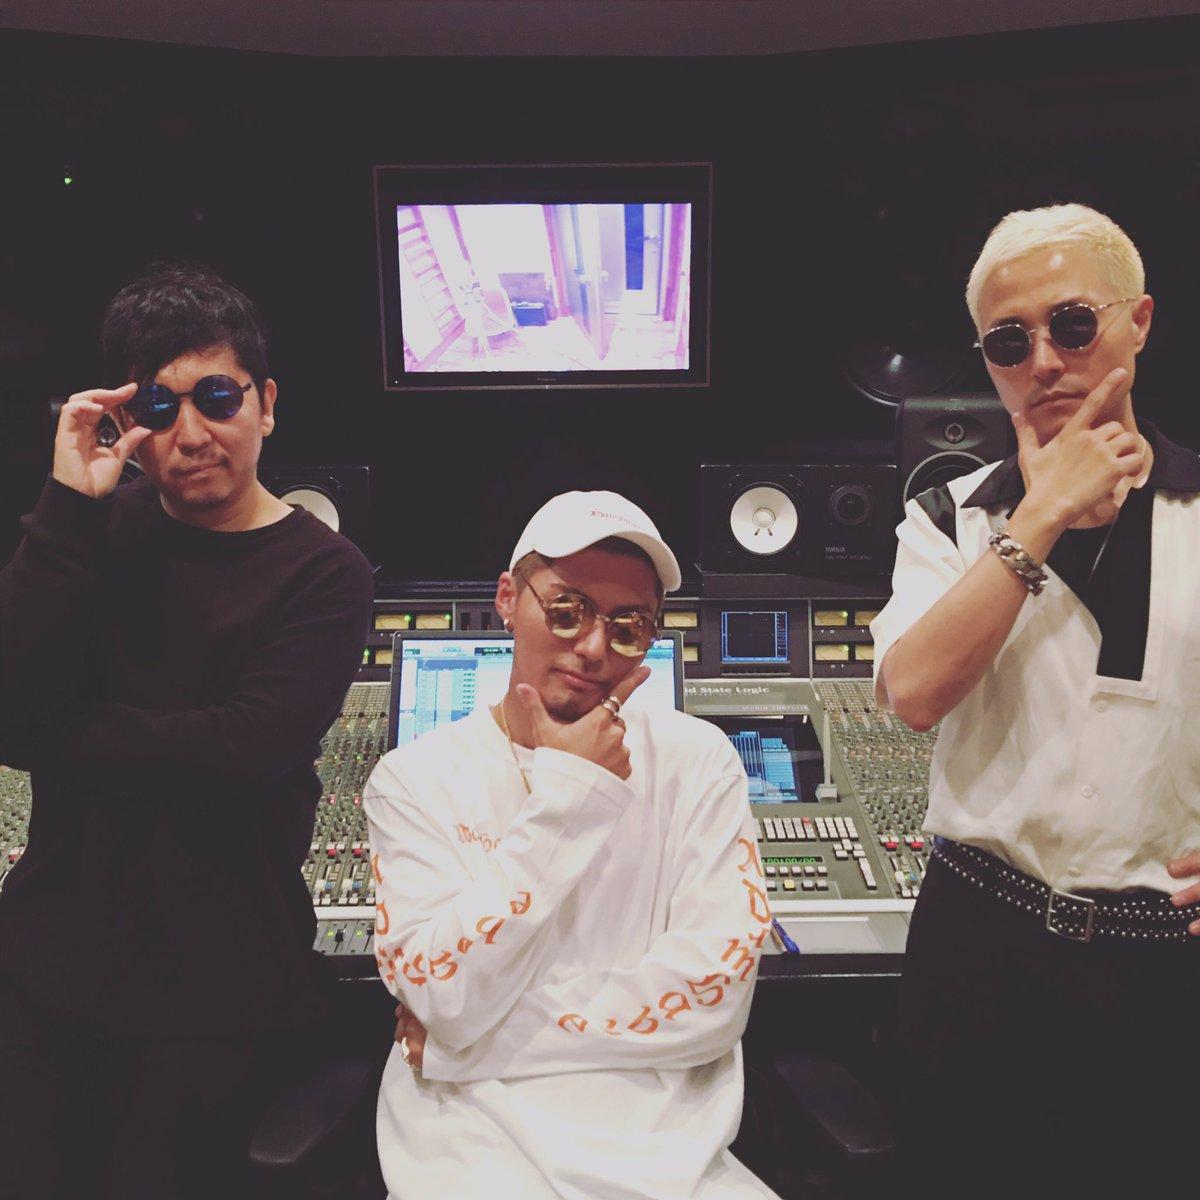 #exile #Shokichi さんと @verbal_ambush と一緒にスタジオにてパシャり